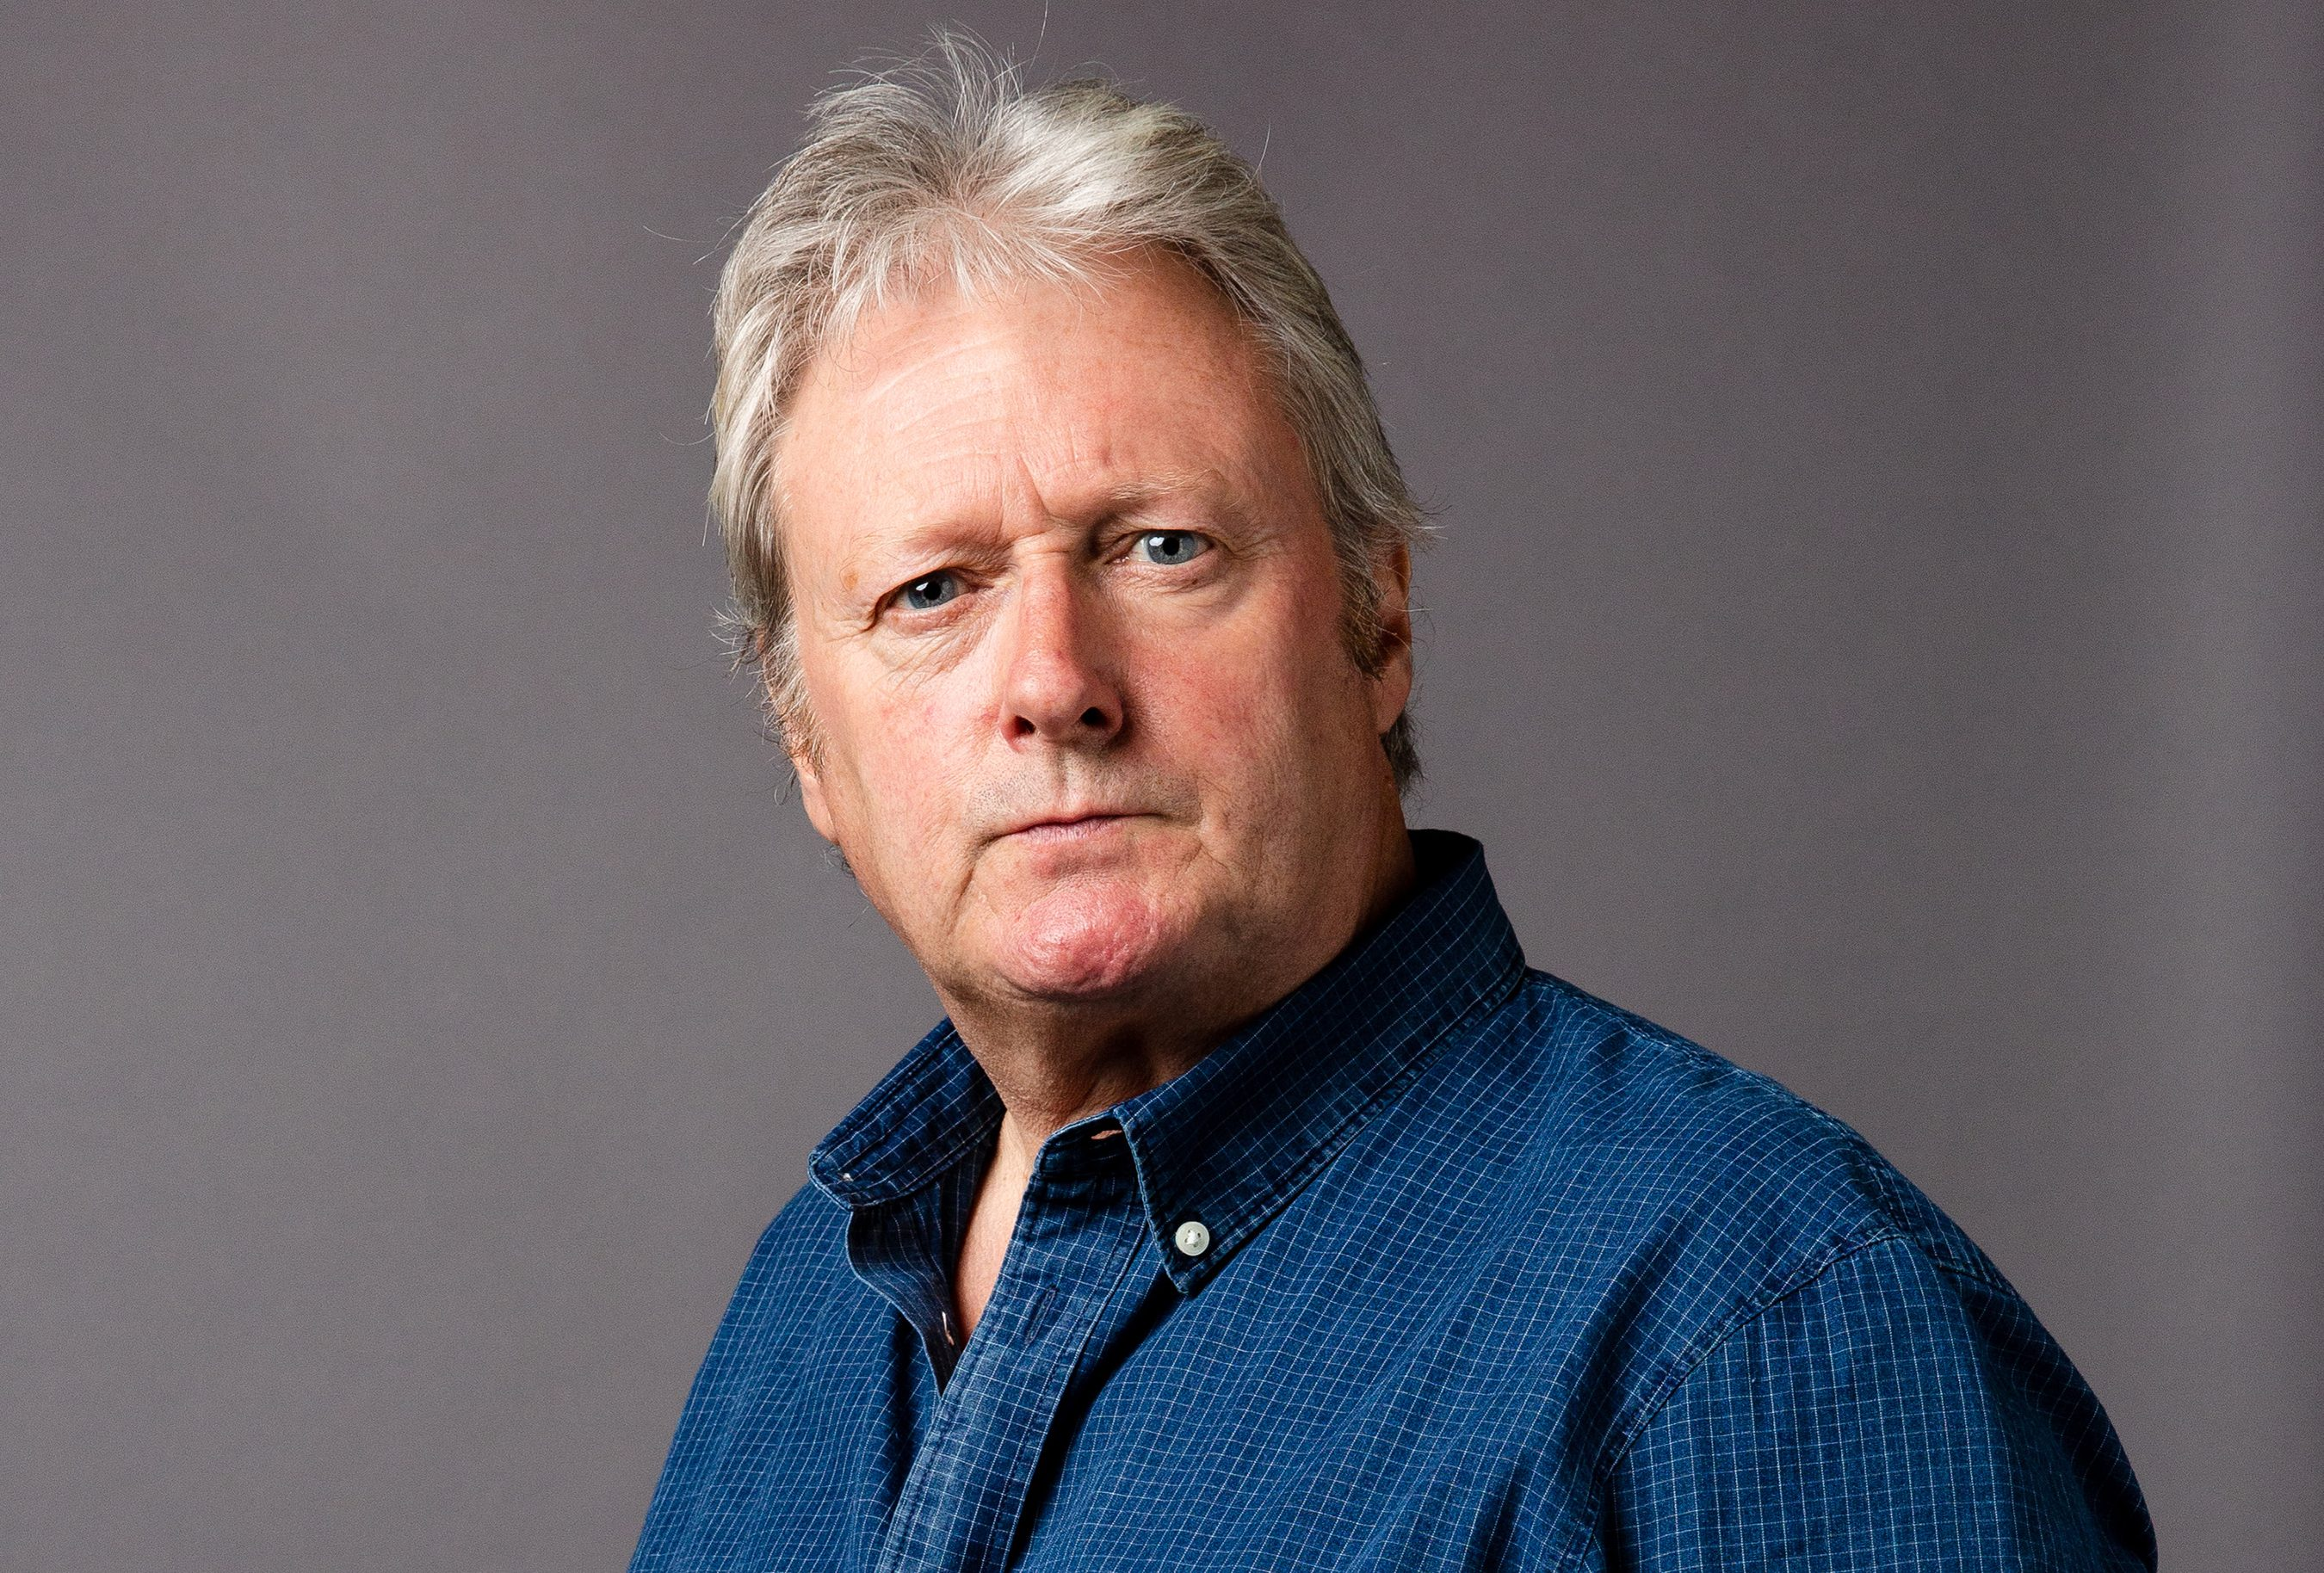 Jim McDonald is back in Coronation Street